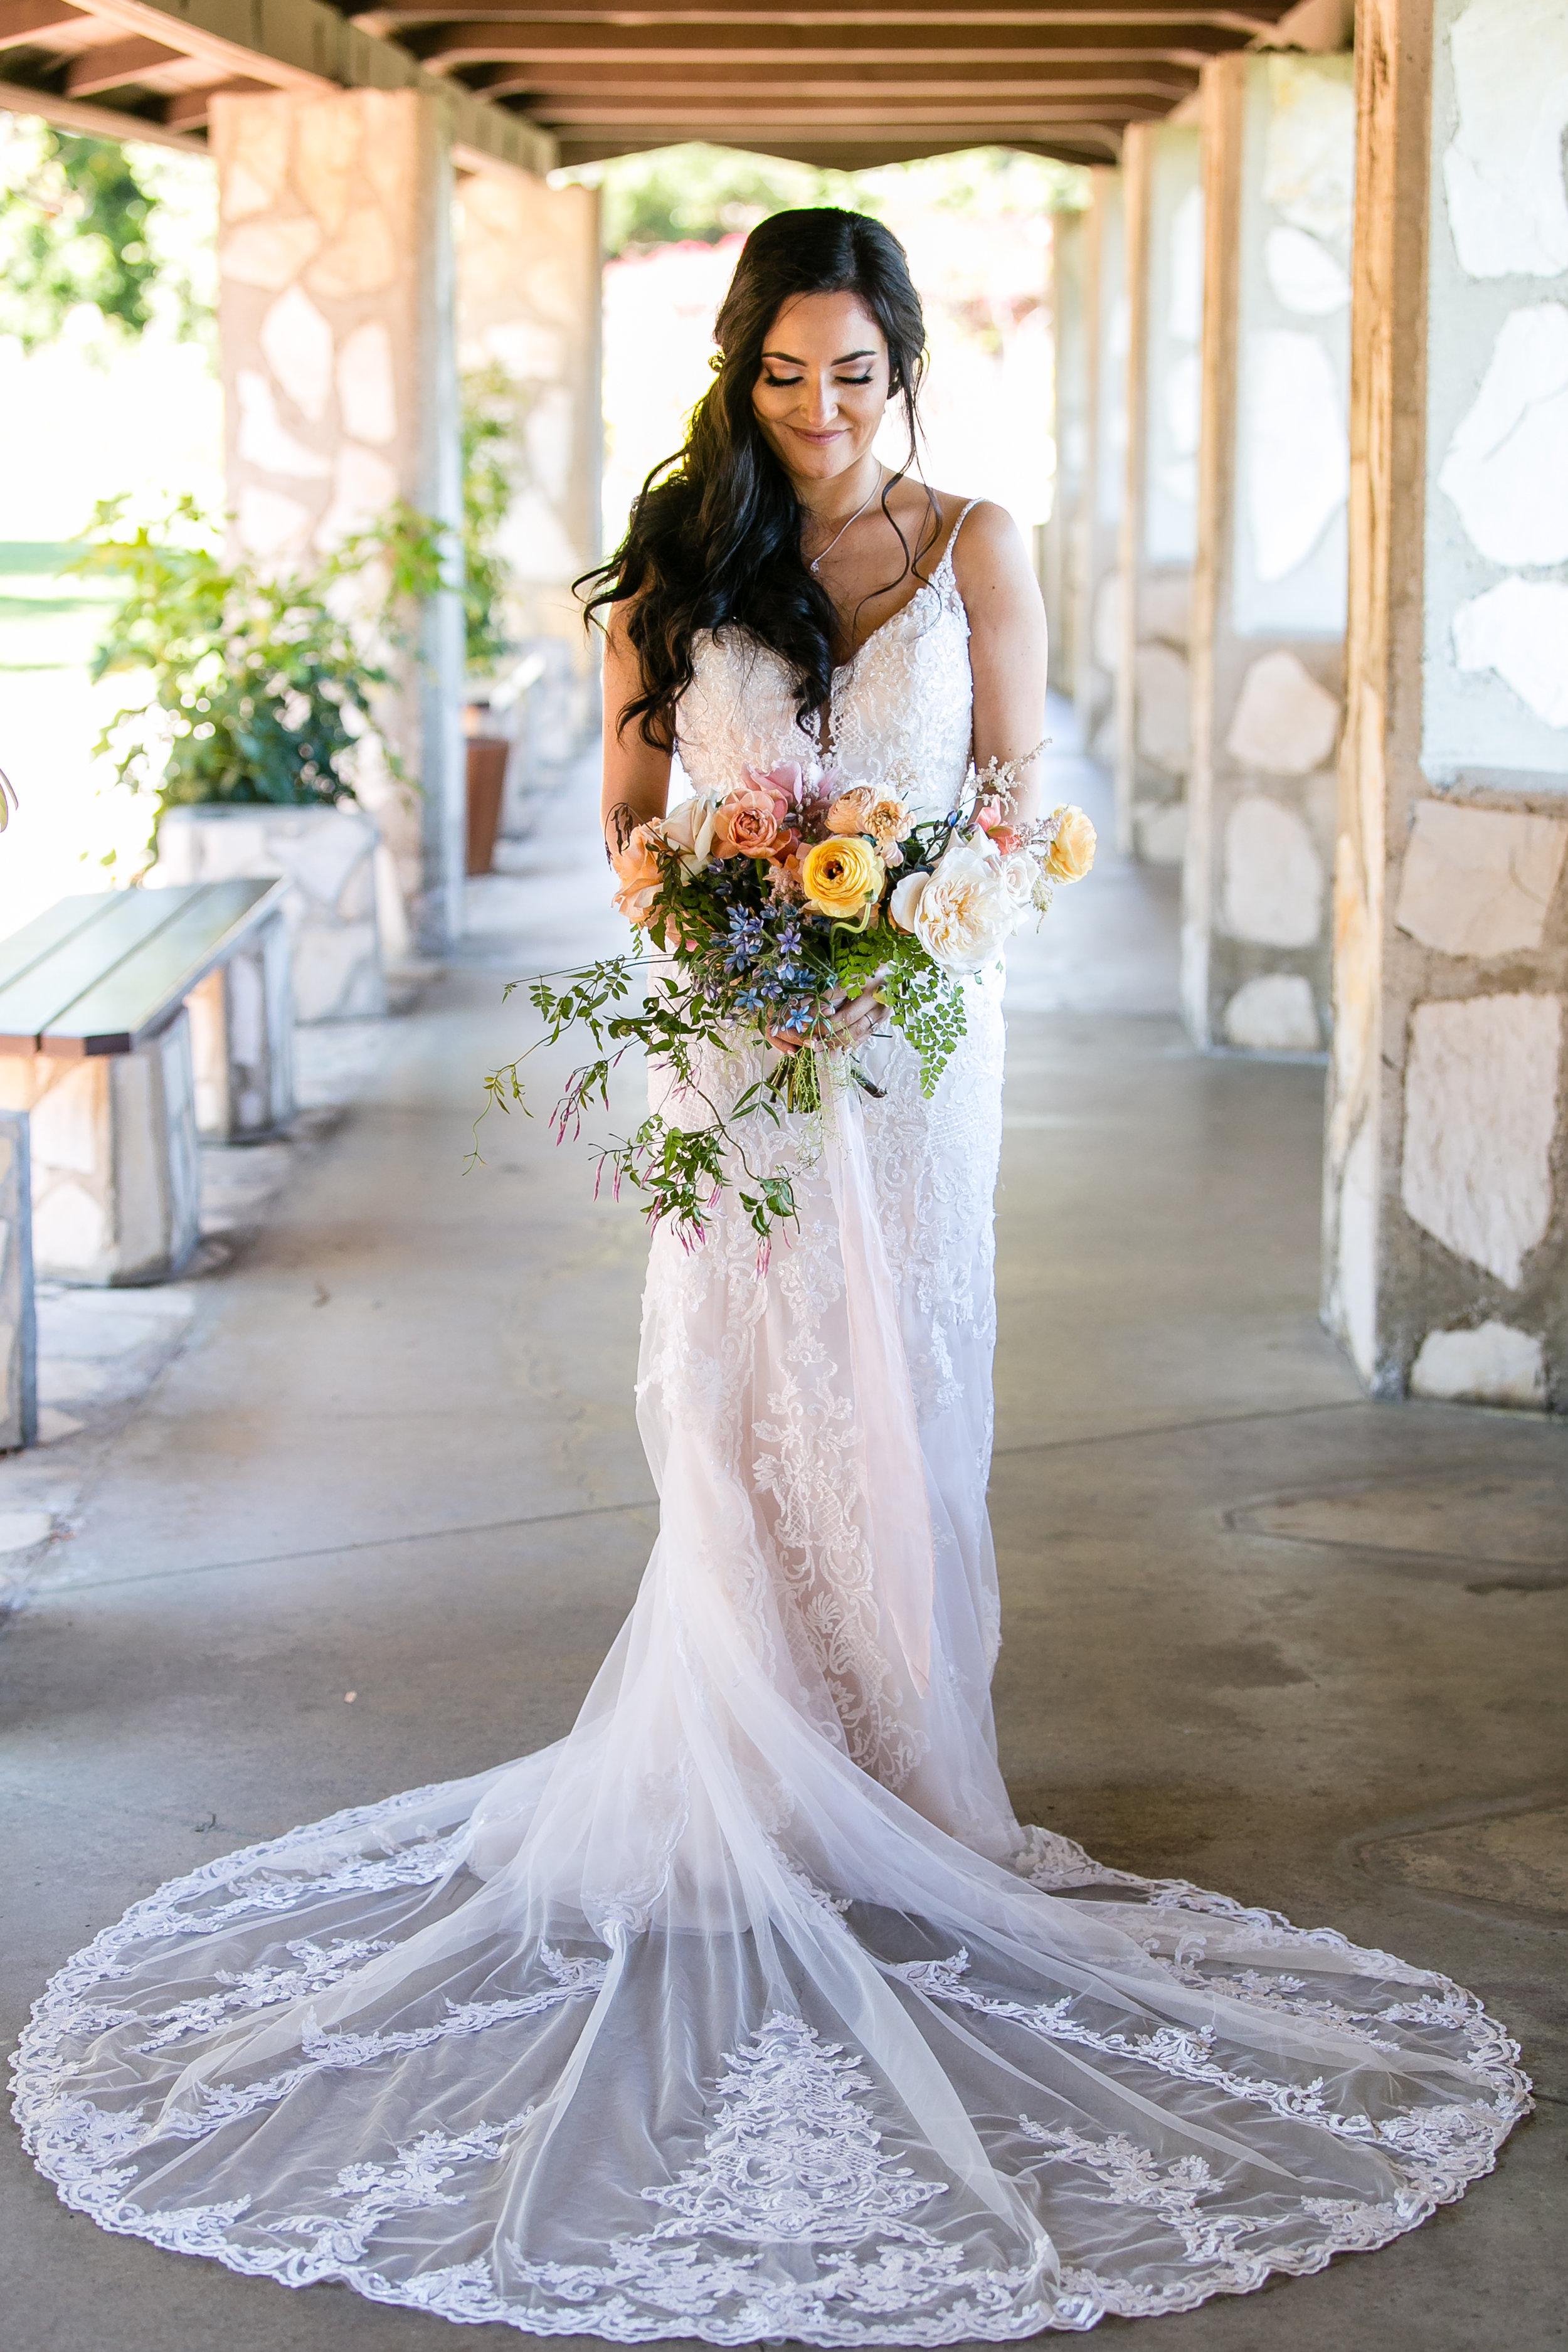 2019_05_24_Wedding_Barajas_0392.jpg